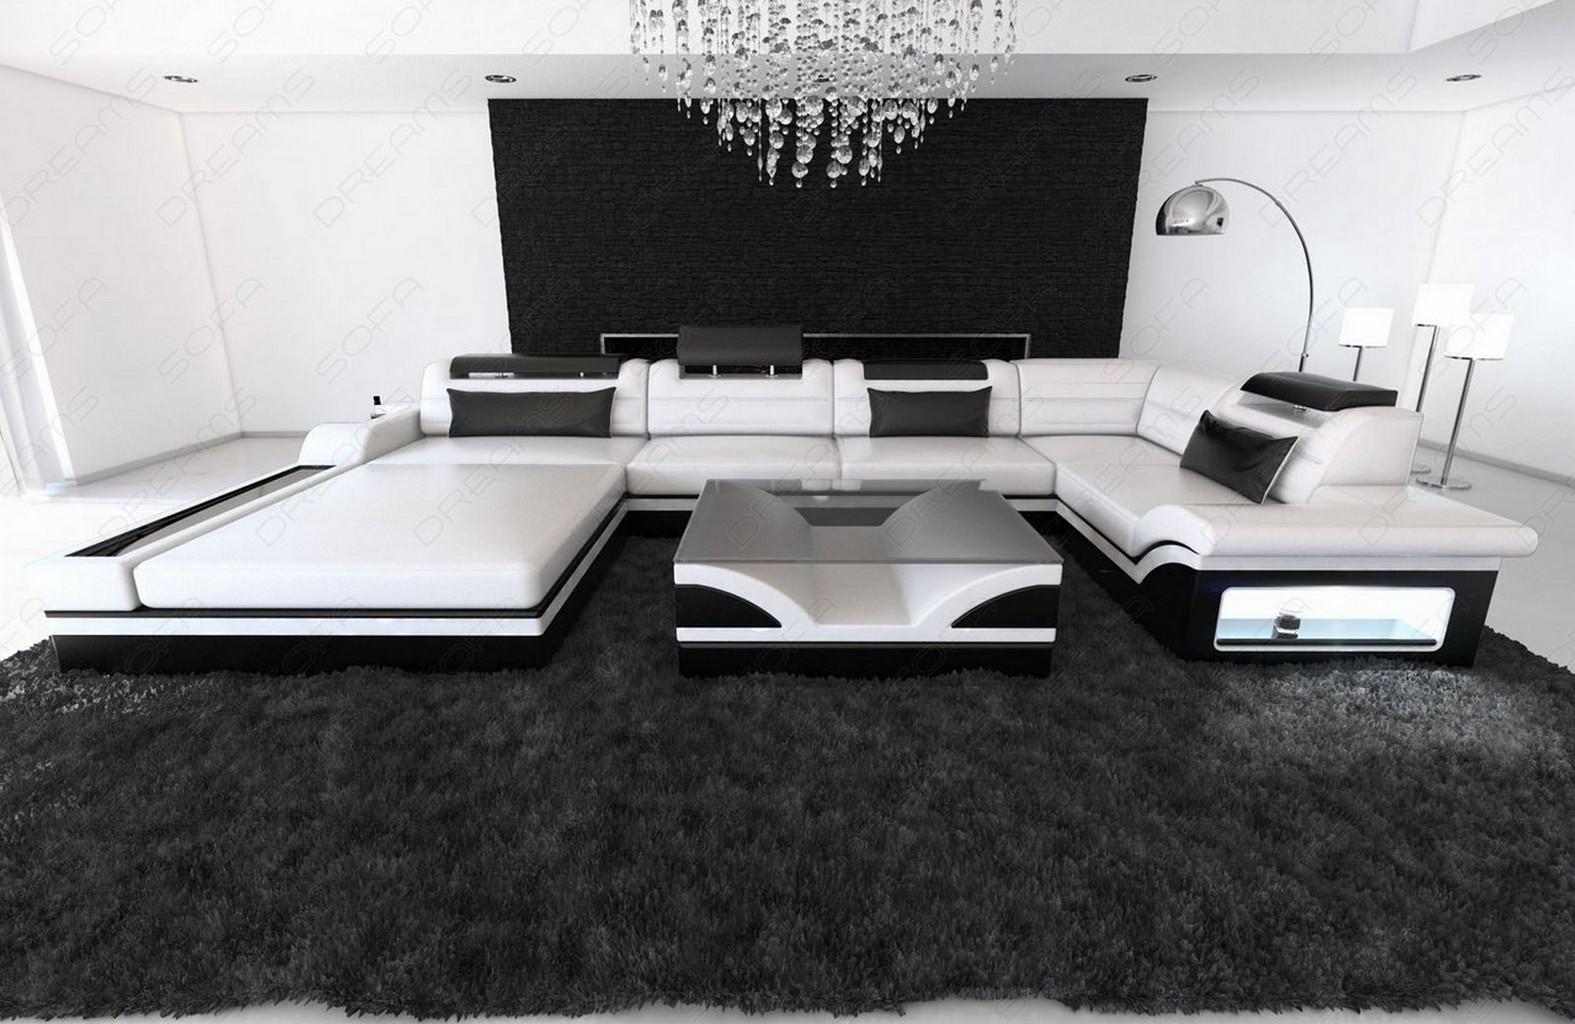 Echtledercouch wohnlandschaft mezzo led luxussofa design for Echtleder sofa u form